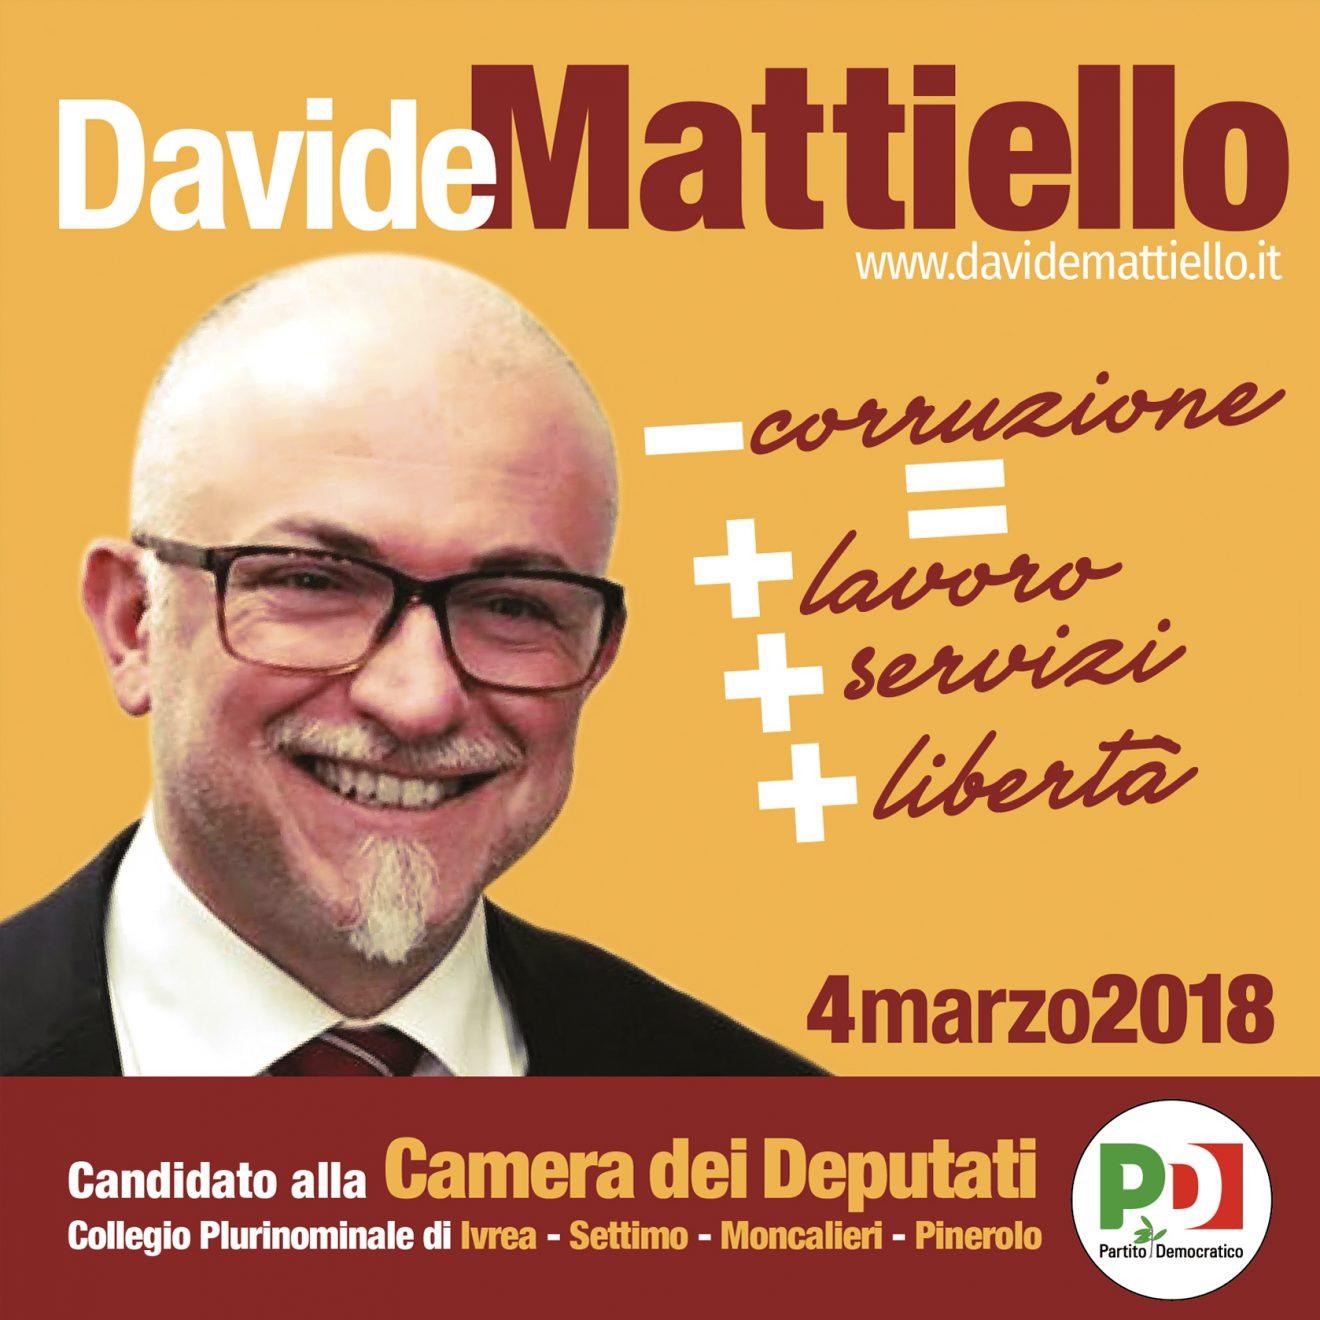 Mattiellosocial-1320x1320-2